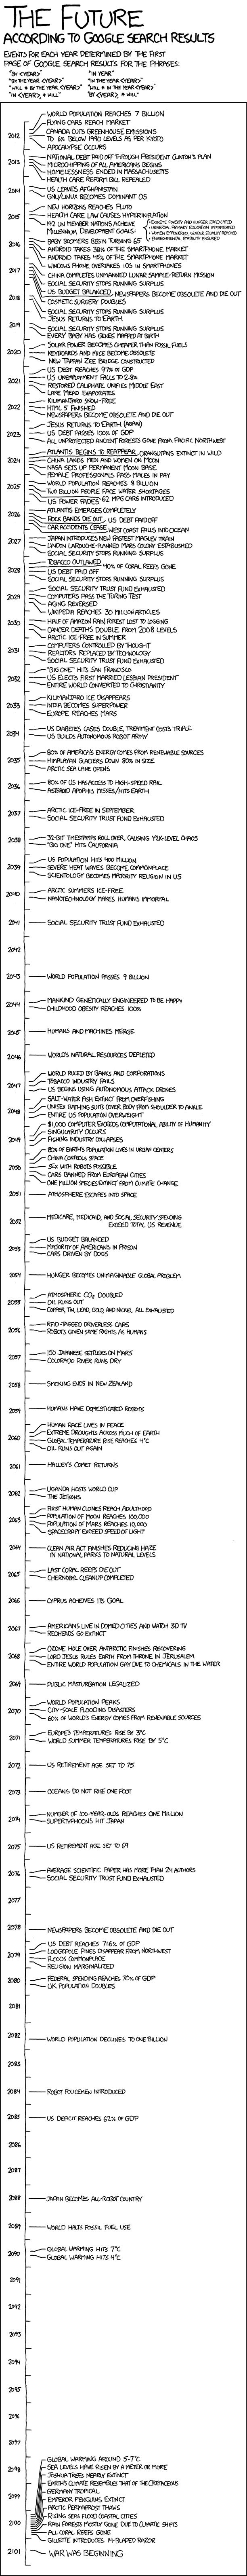 future_timeline